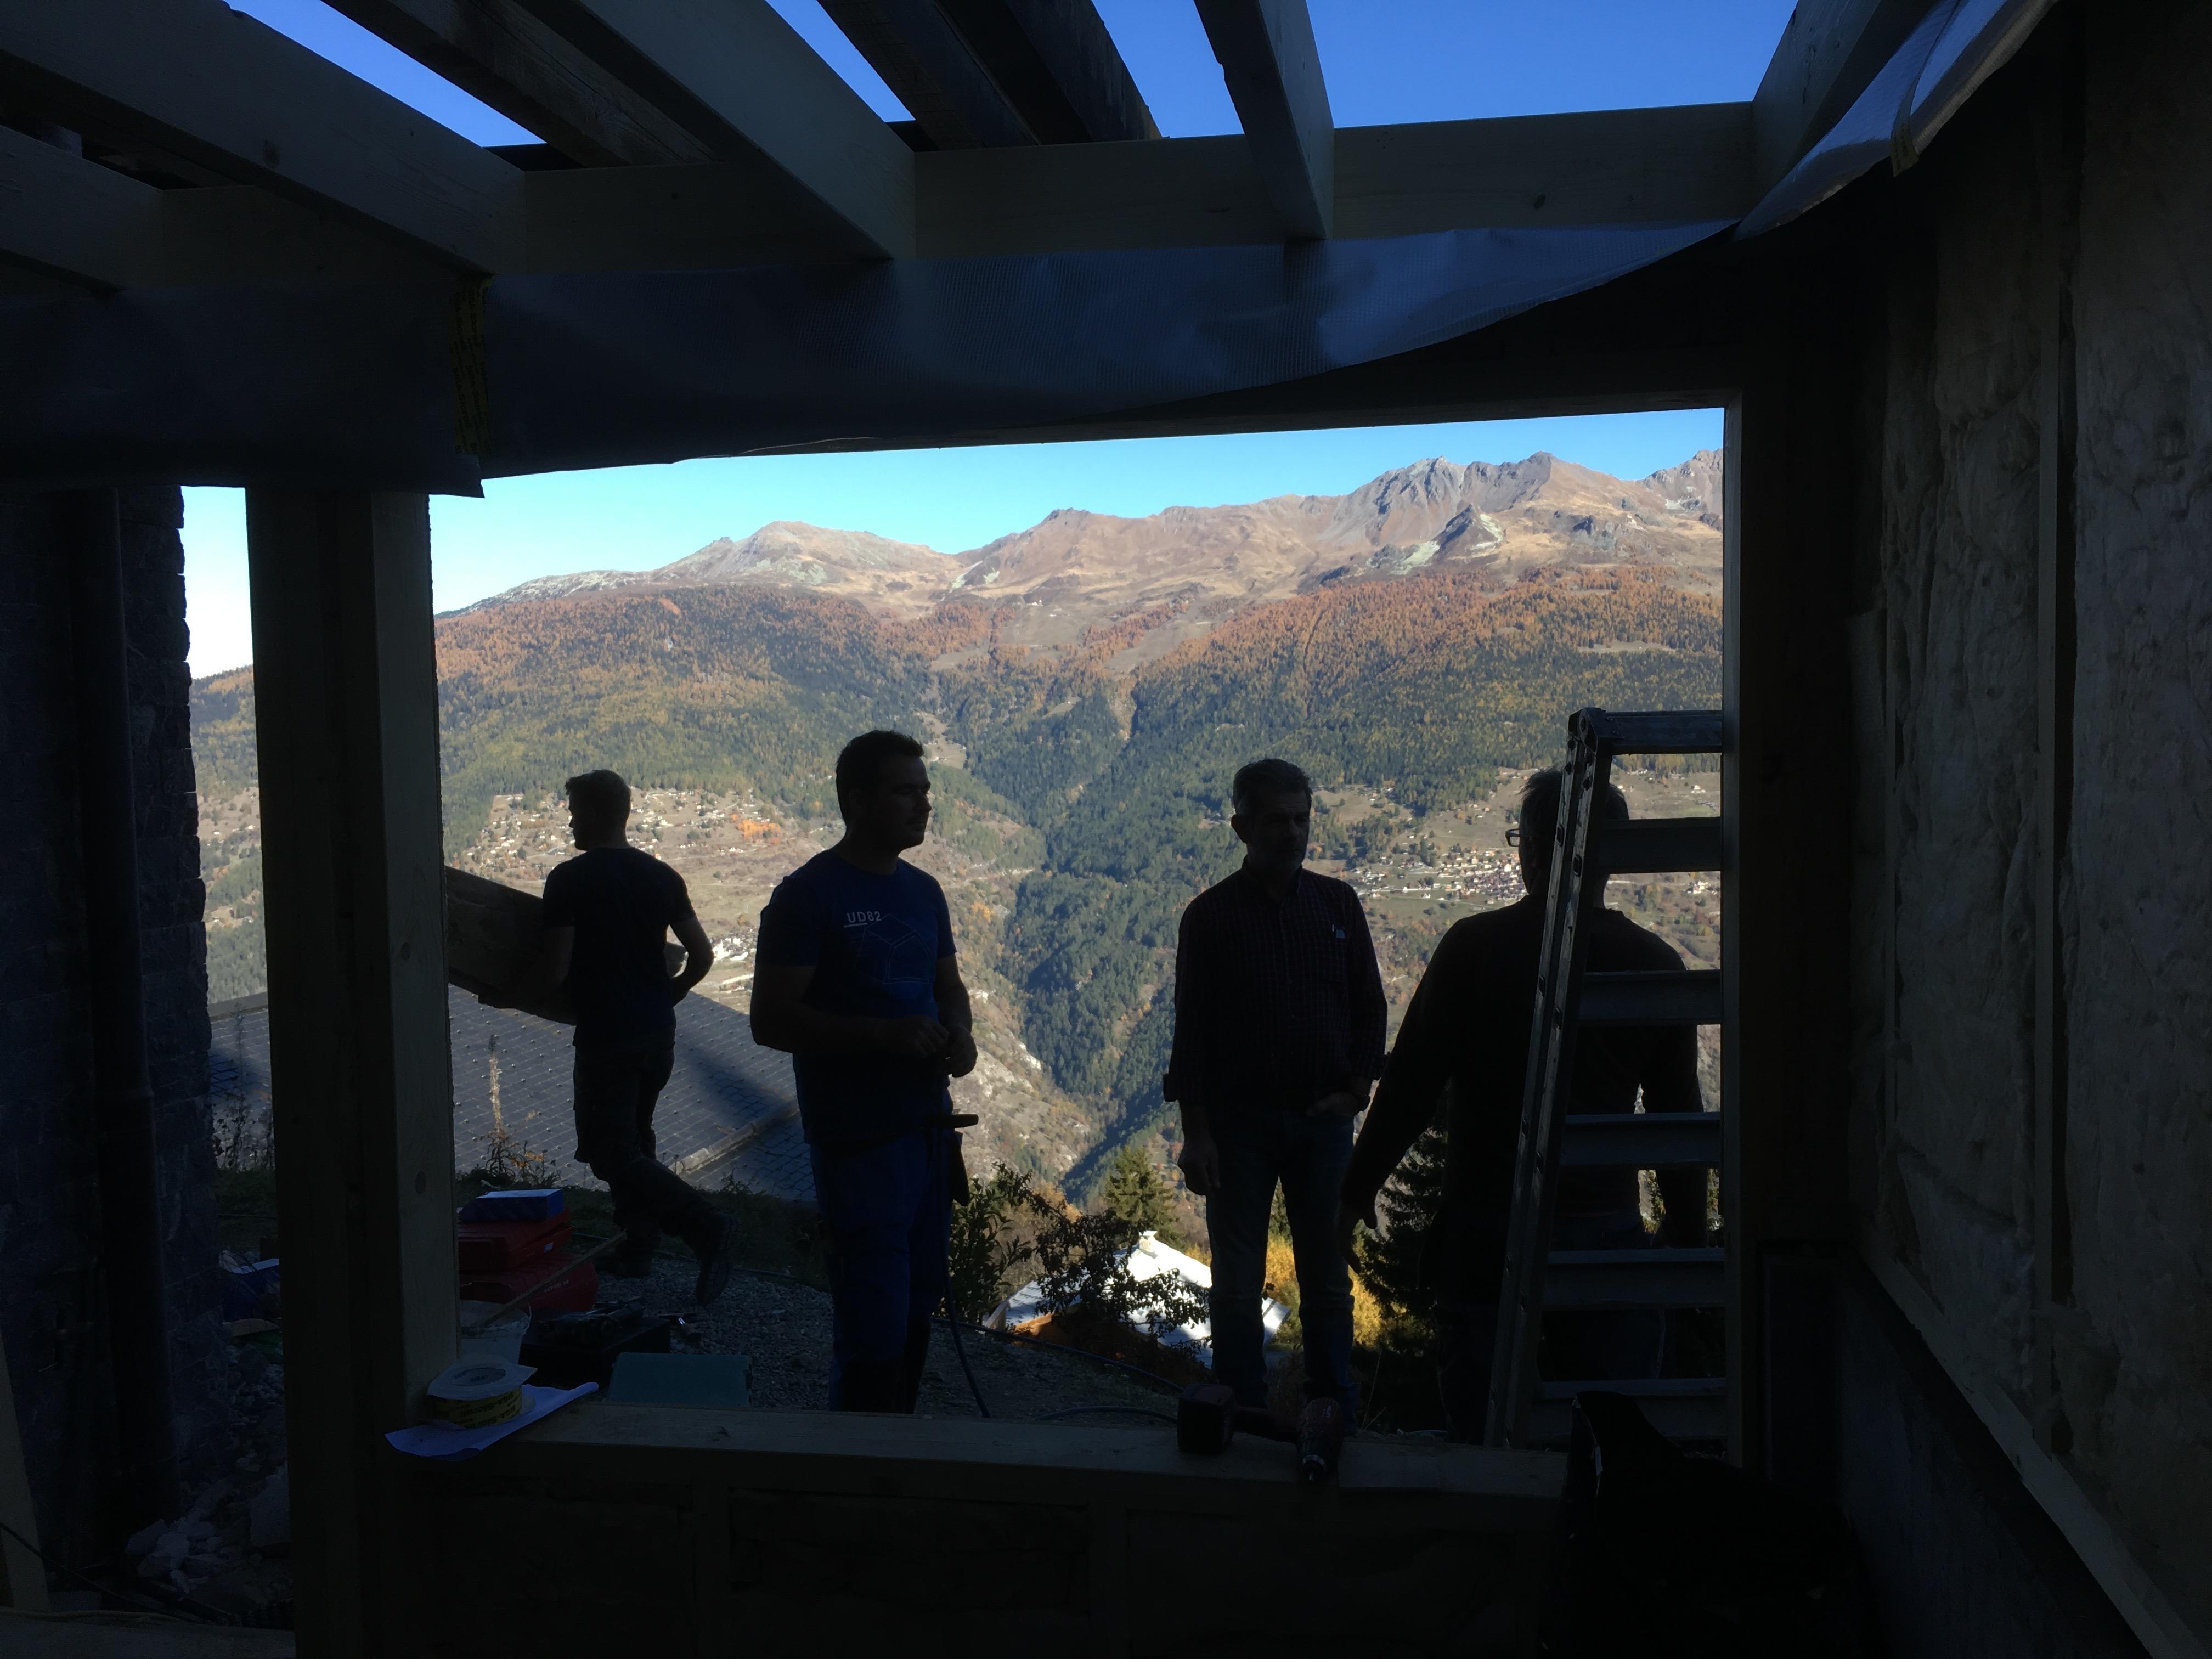 Chalet Le Iceberg sauna construction. view.